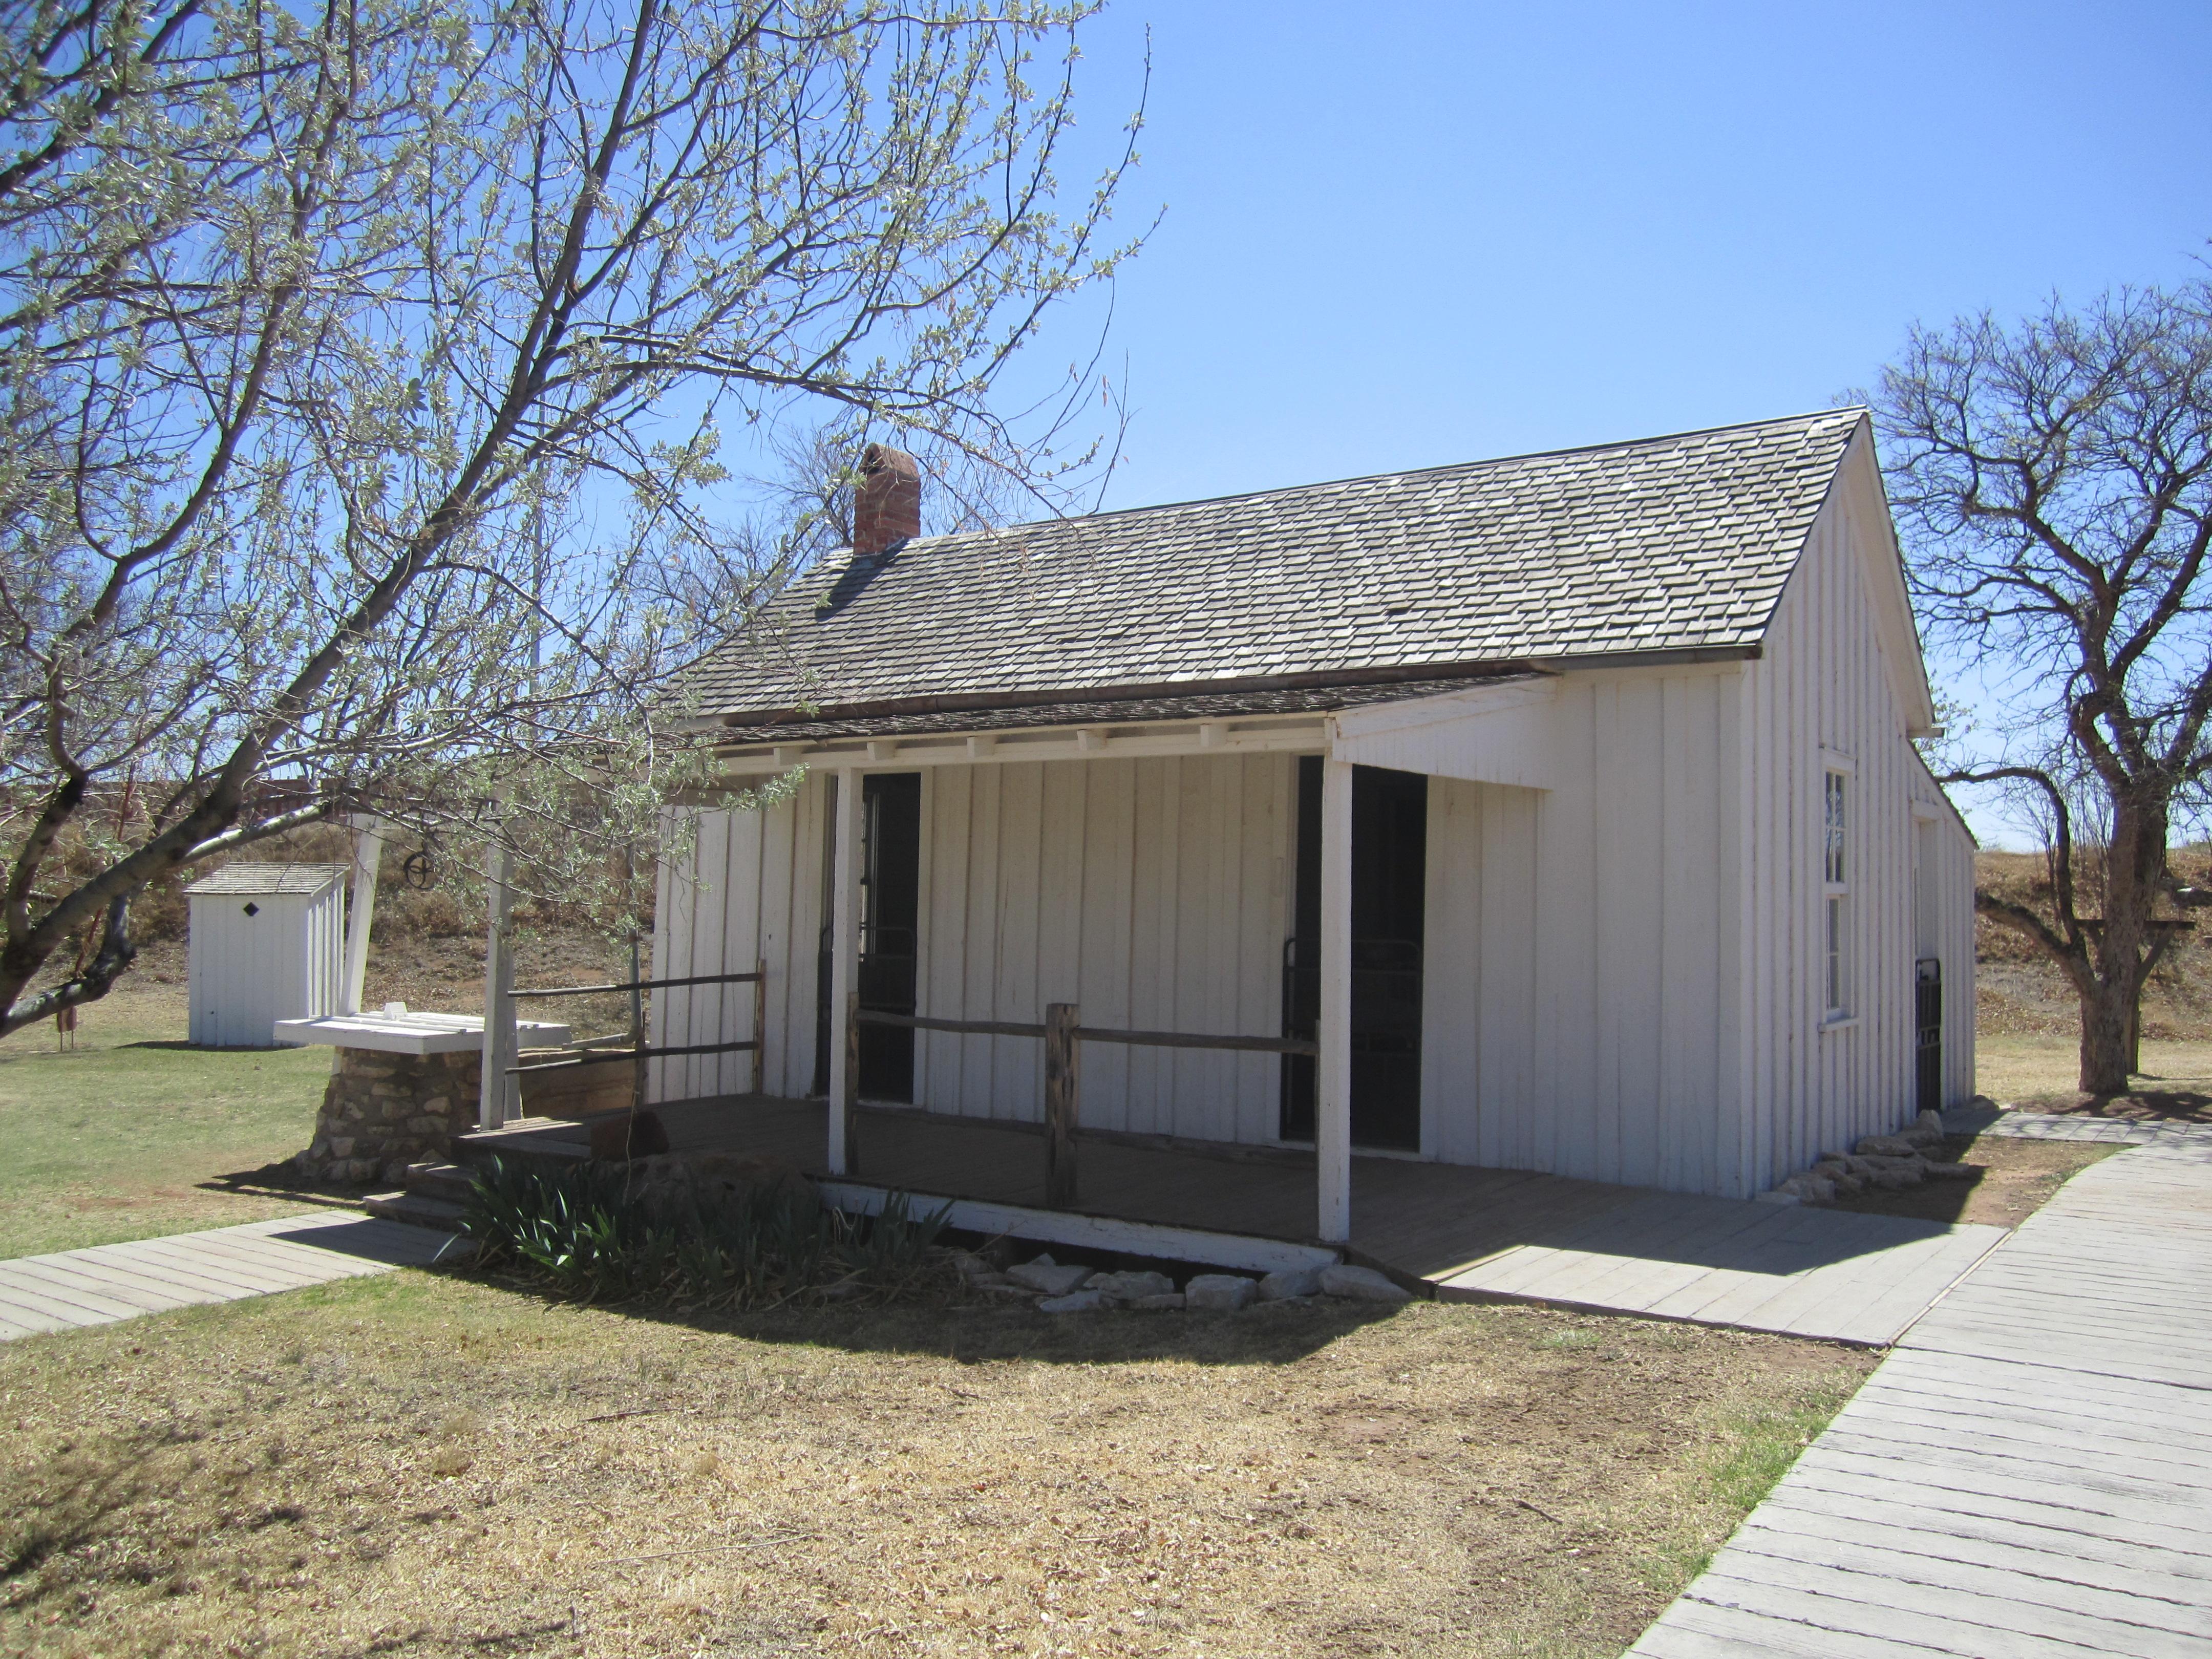 FileBox and Strip House NHRC Lubbock TX IMG 1615JPG